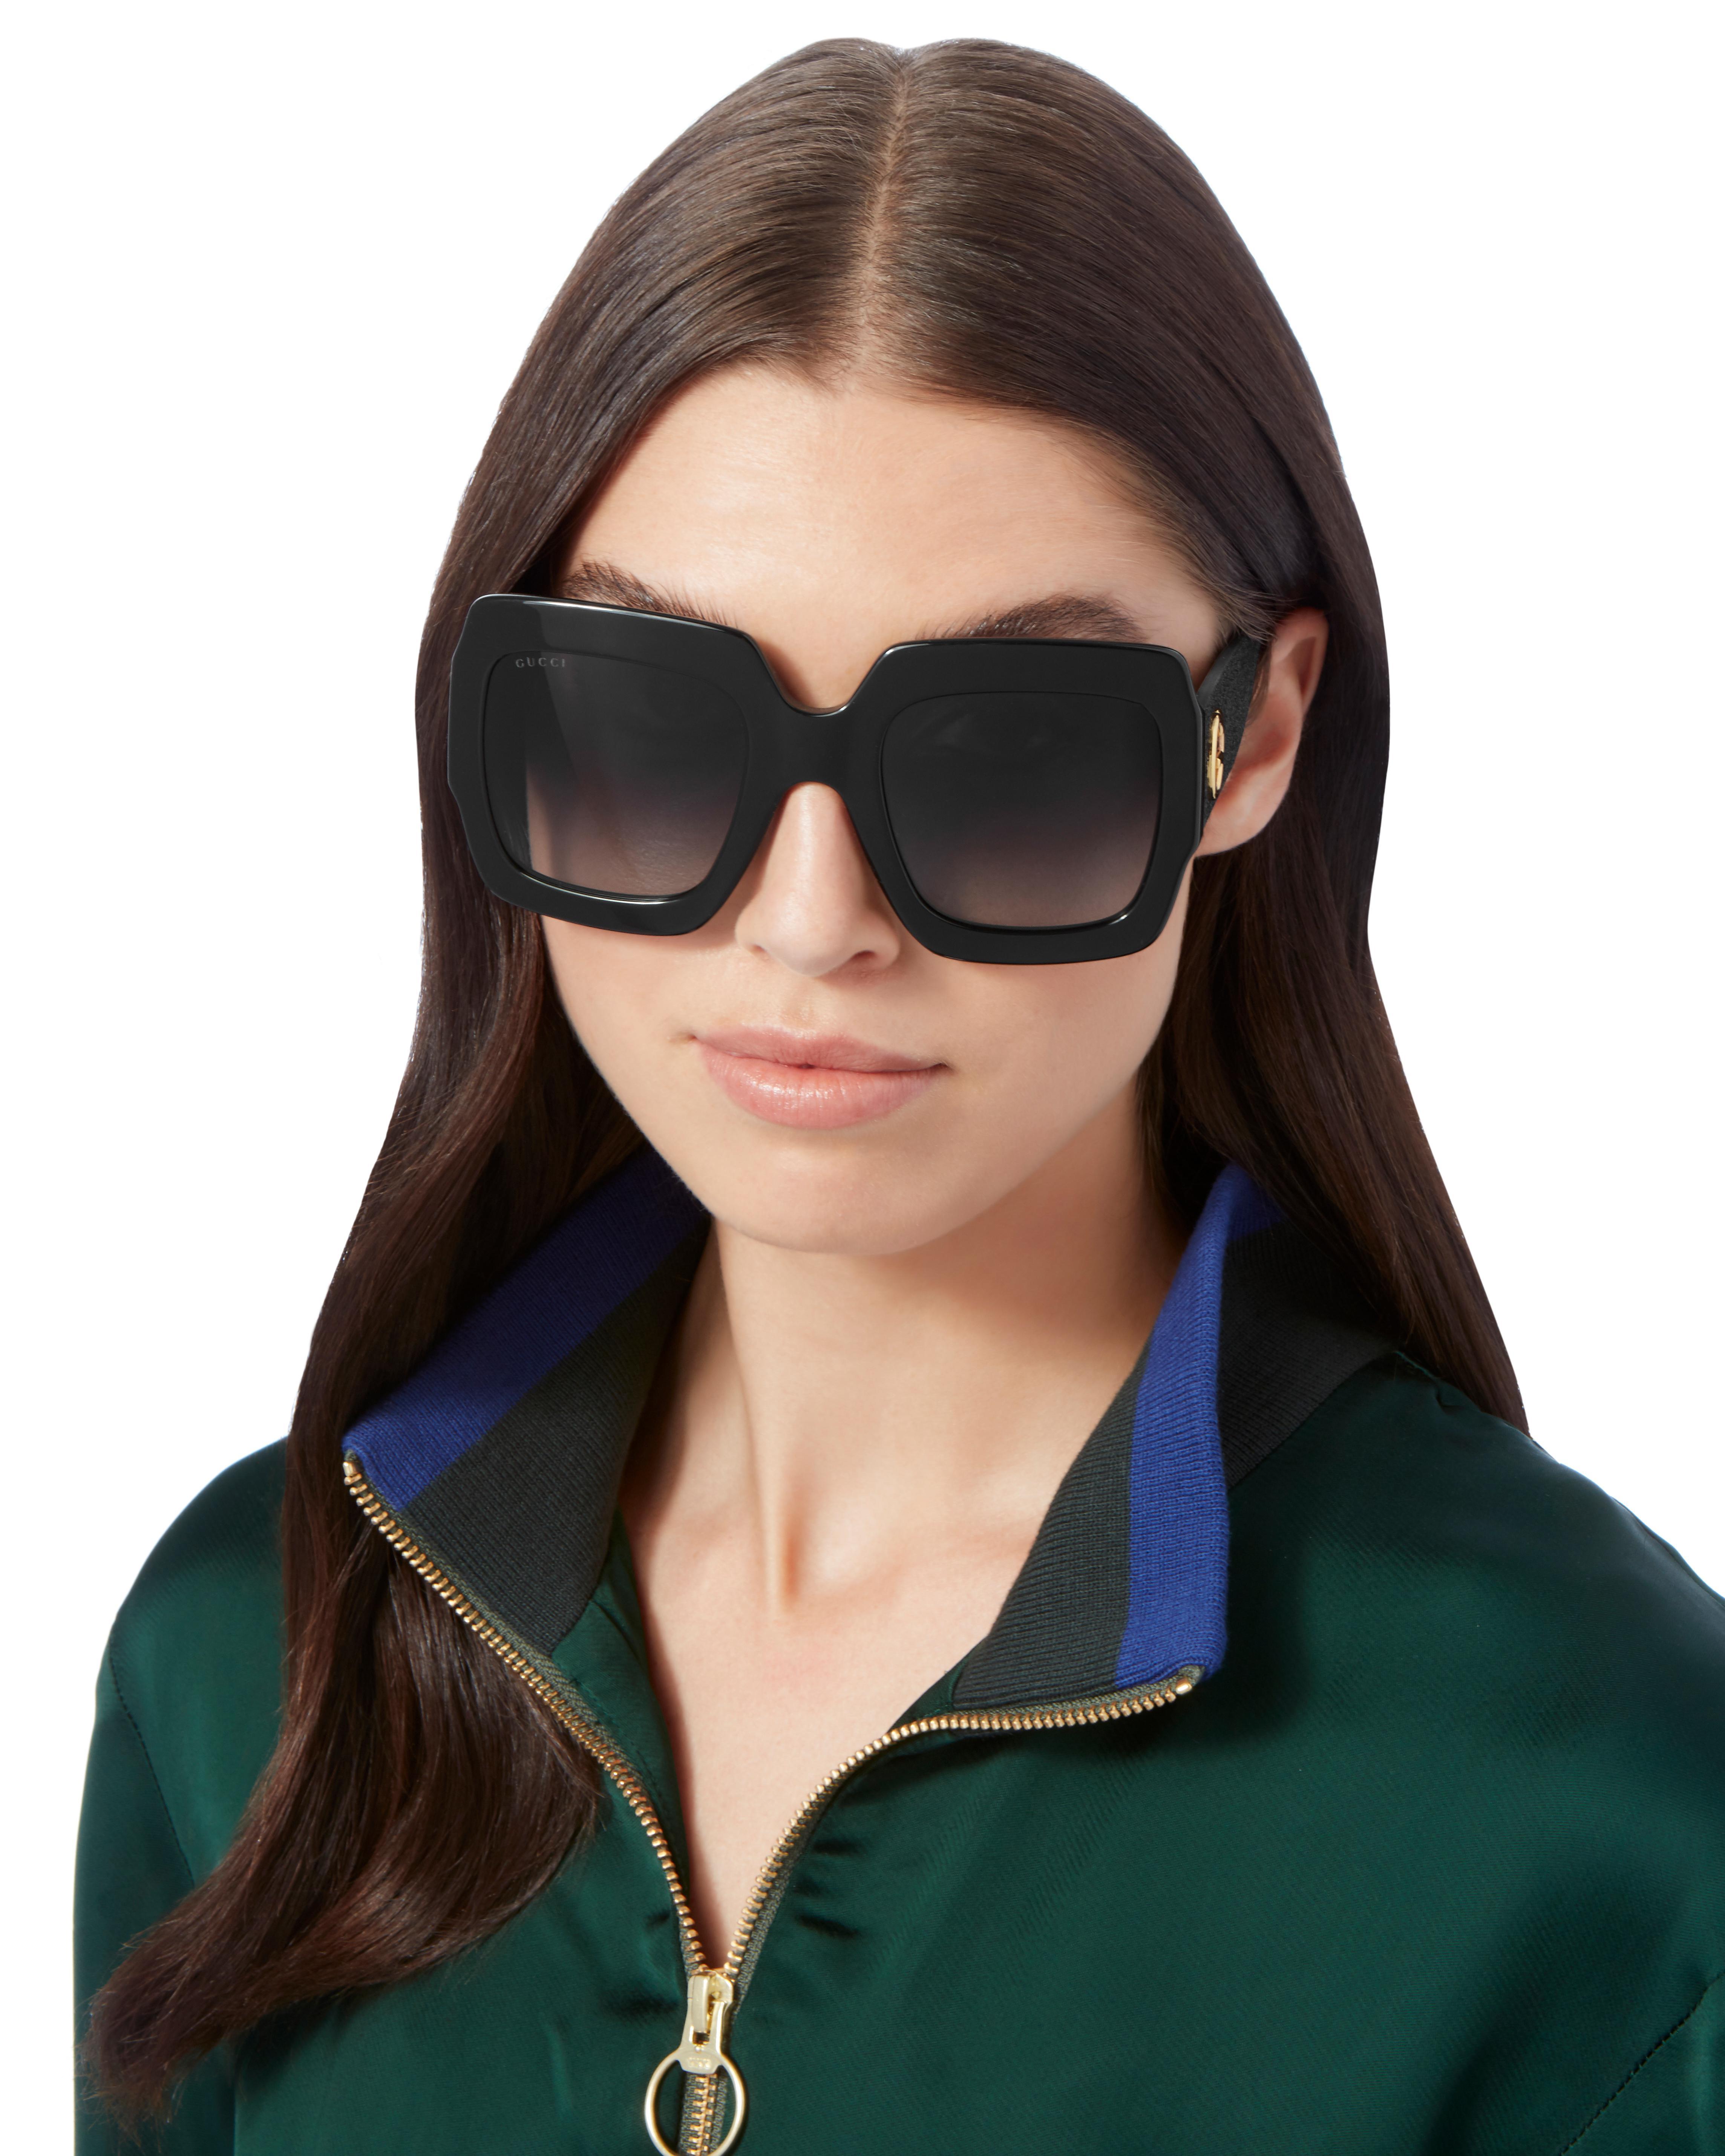 6a6977d23d Lyst - Gucci Oversized Glitter Square Sunglasses in Black